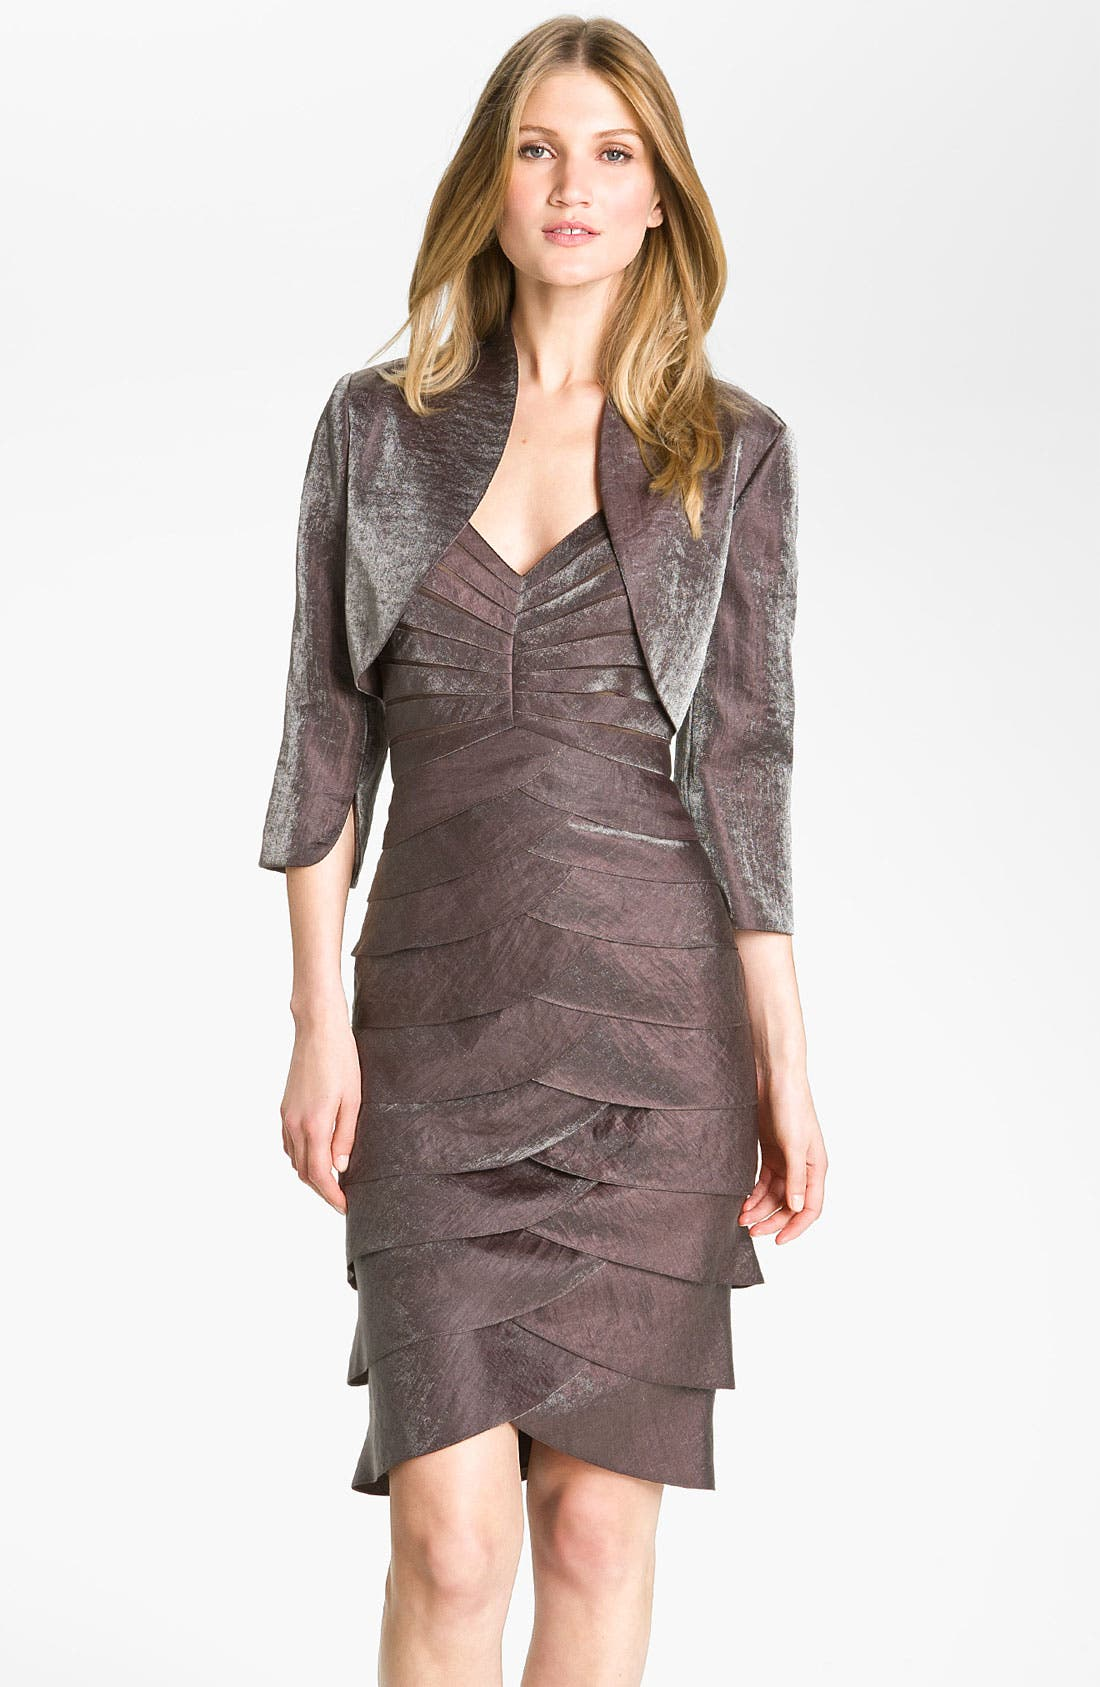 Alternate Image 1 Selected - Adrianna Papell Tiered Hammered Satin Sheath Dress & Bolero (Regular & Petite)